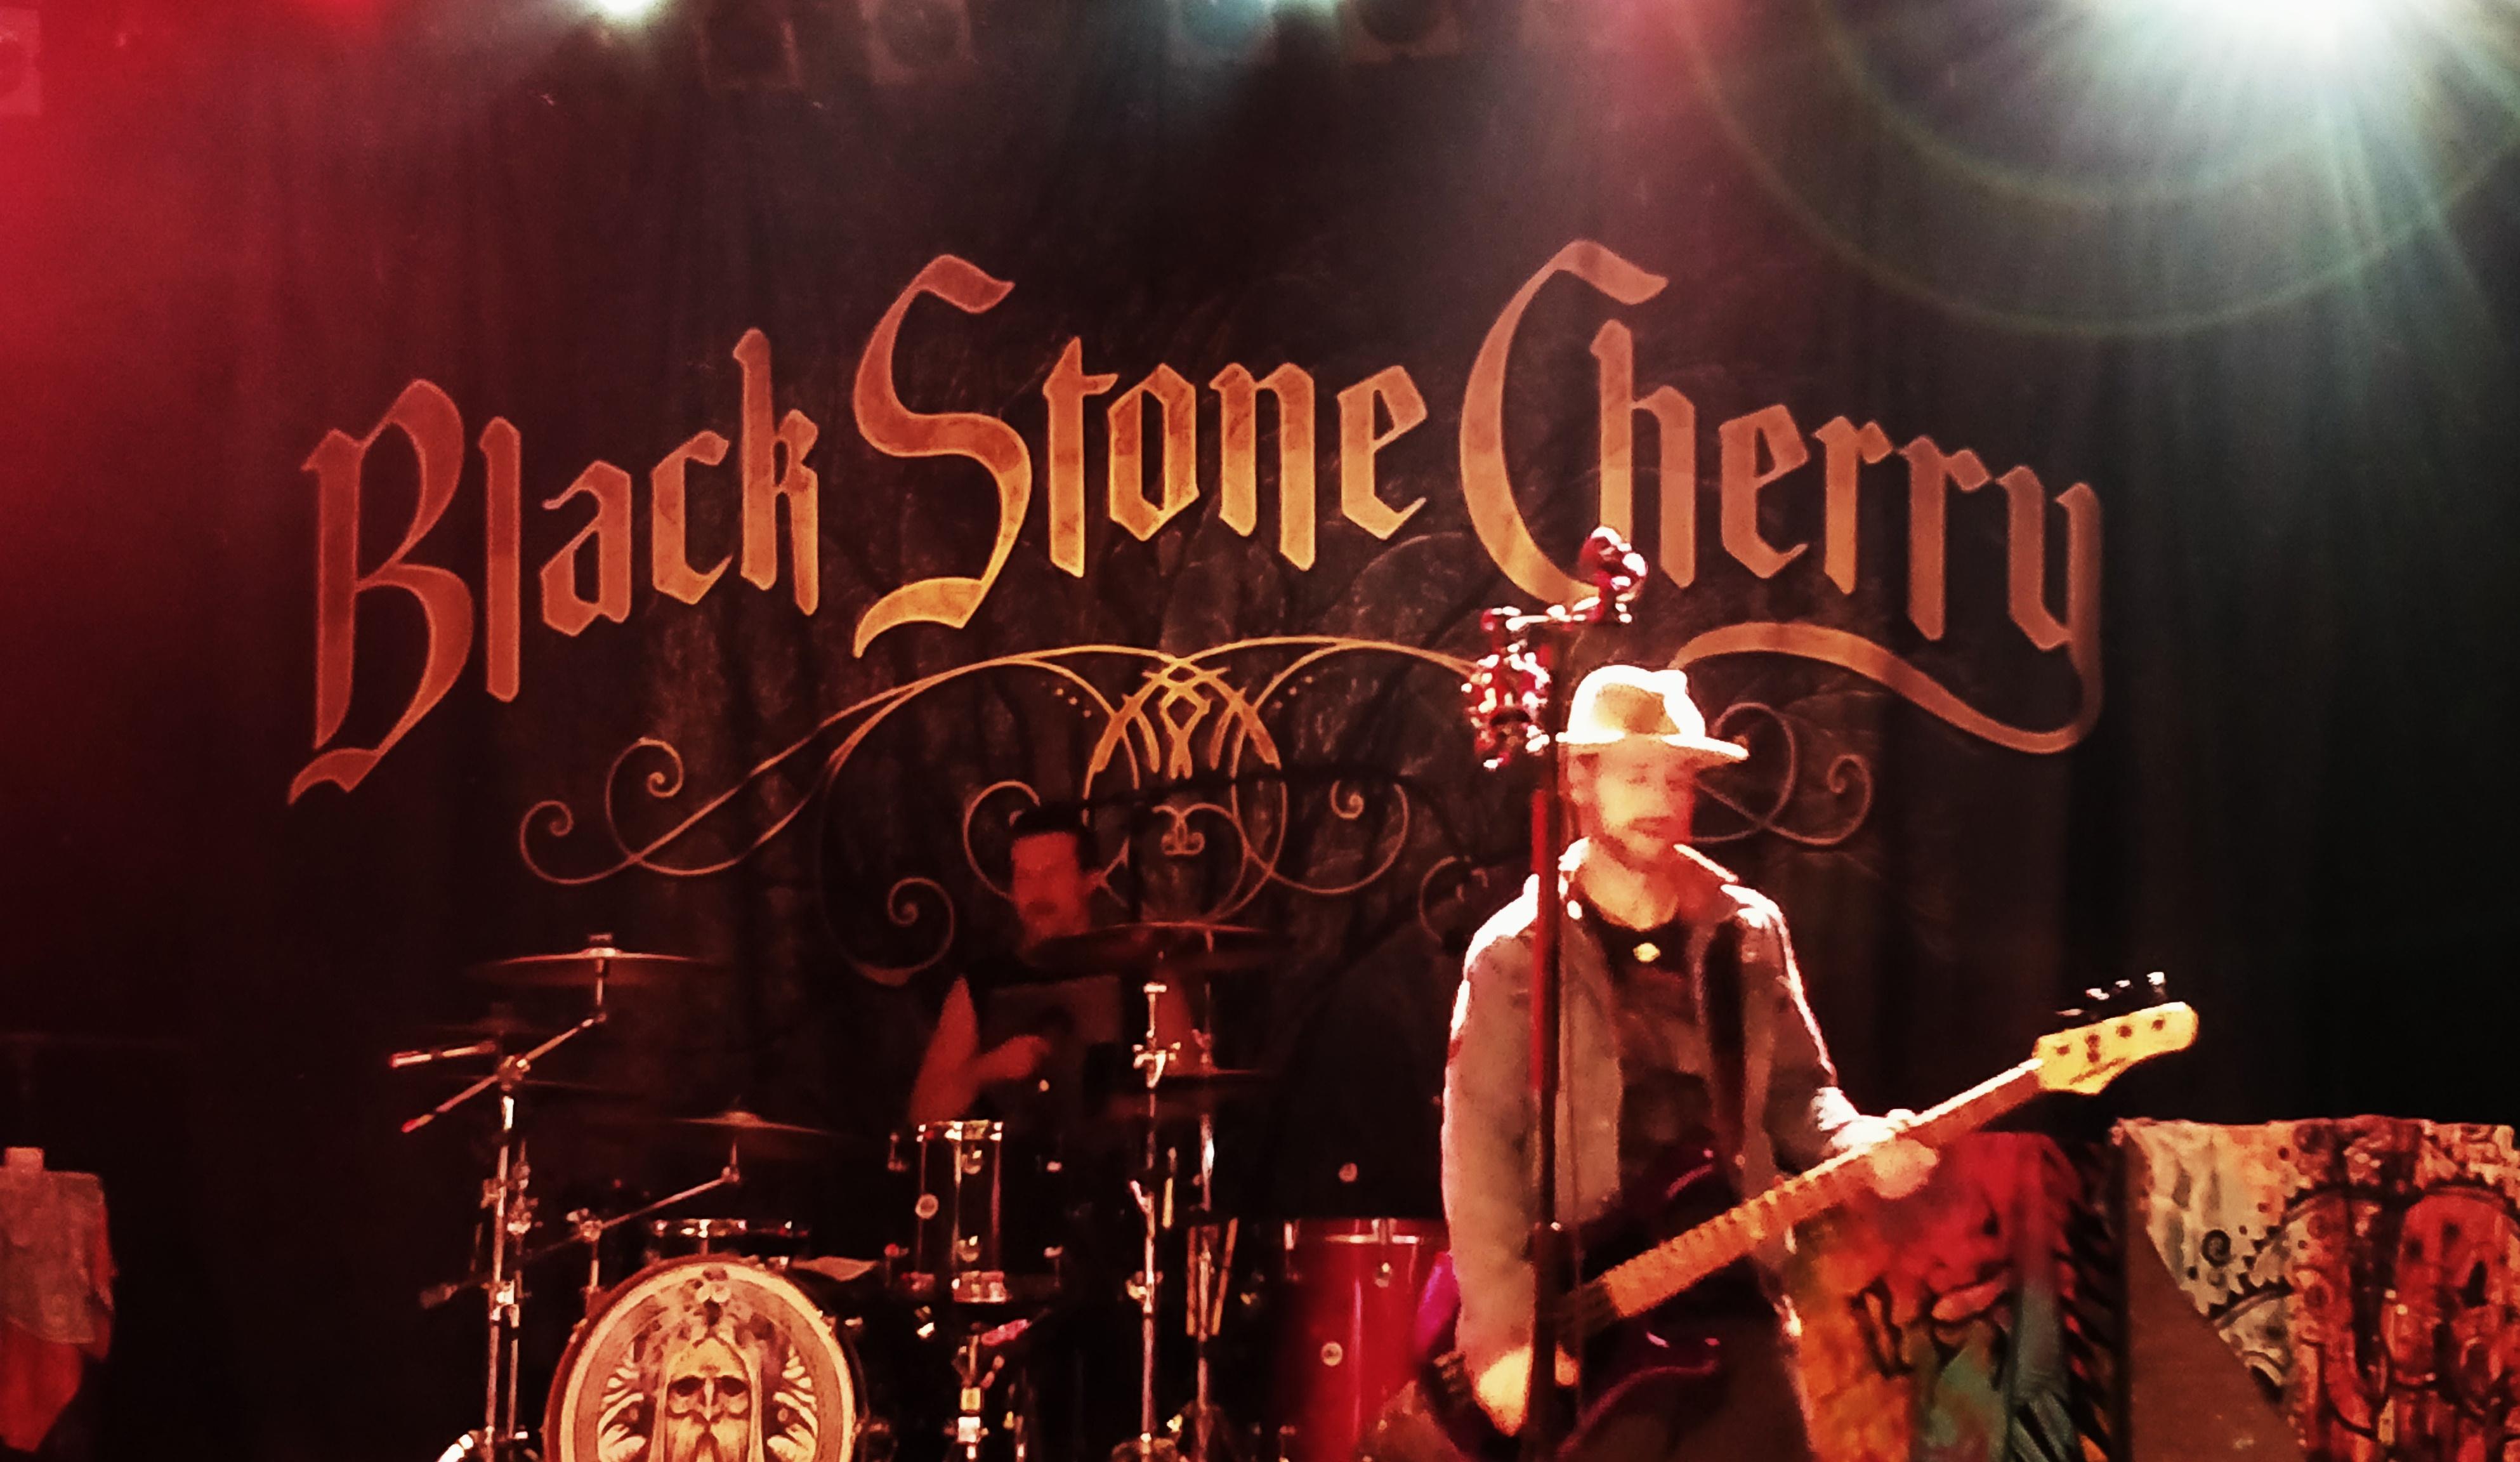 black-stone-cherry-live-in-der-arena-wien-24-november-family-tree-tour-2018